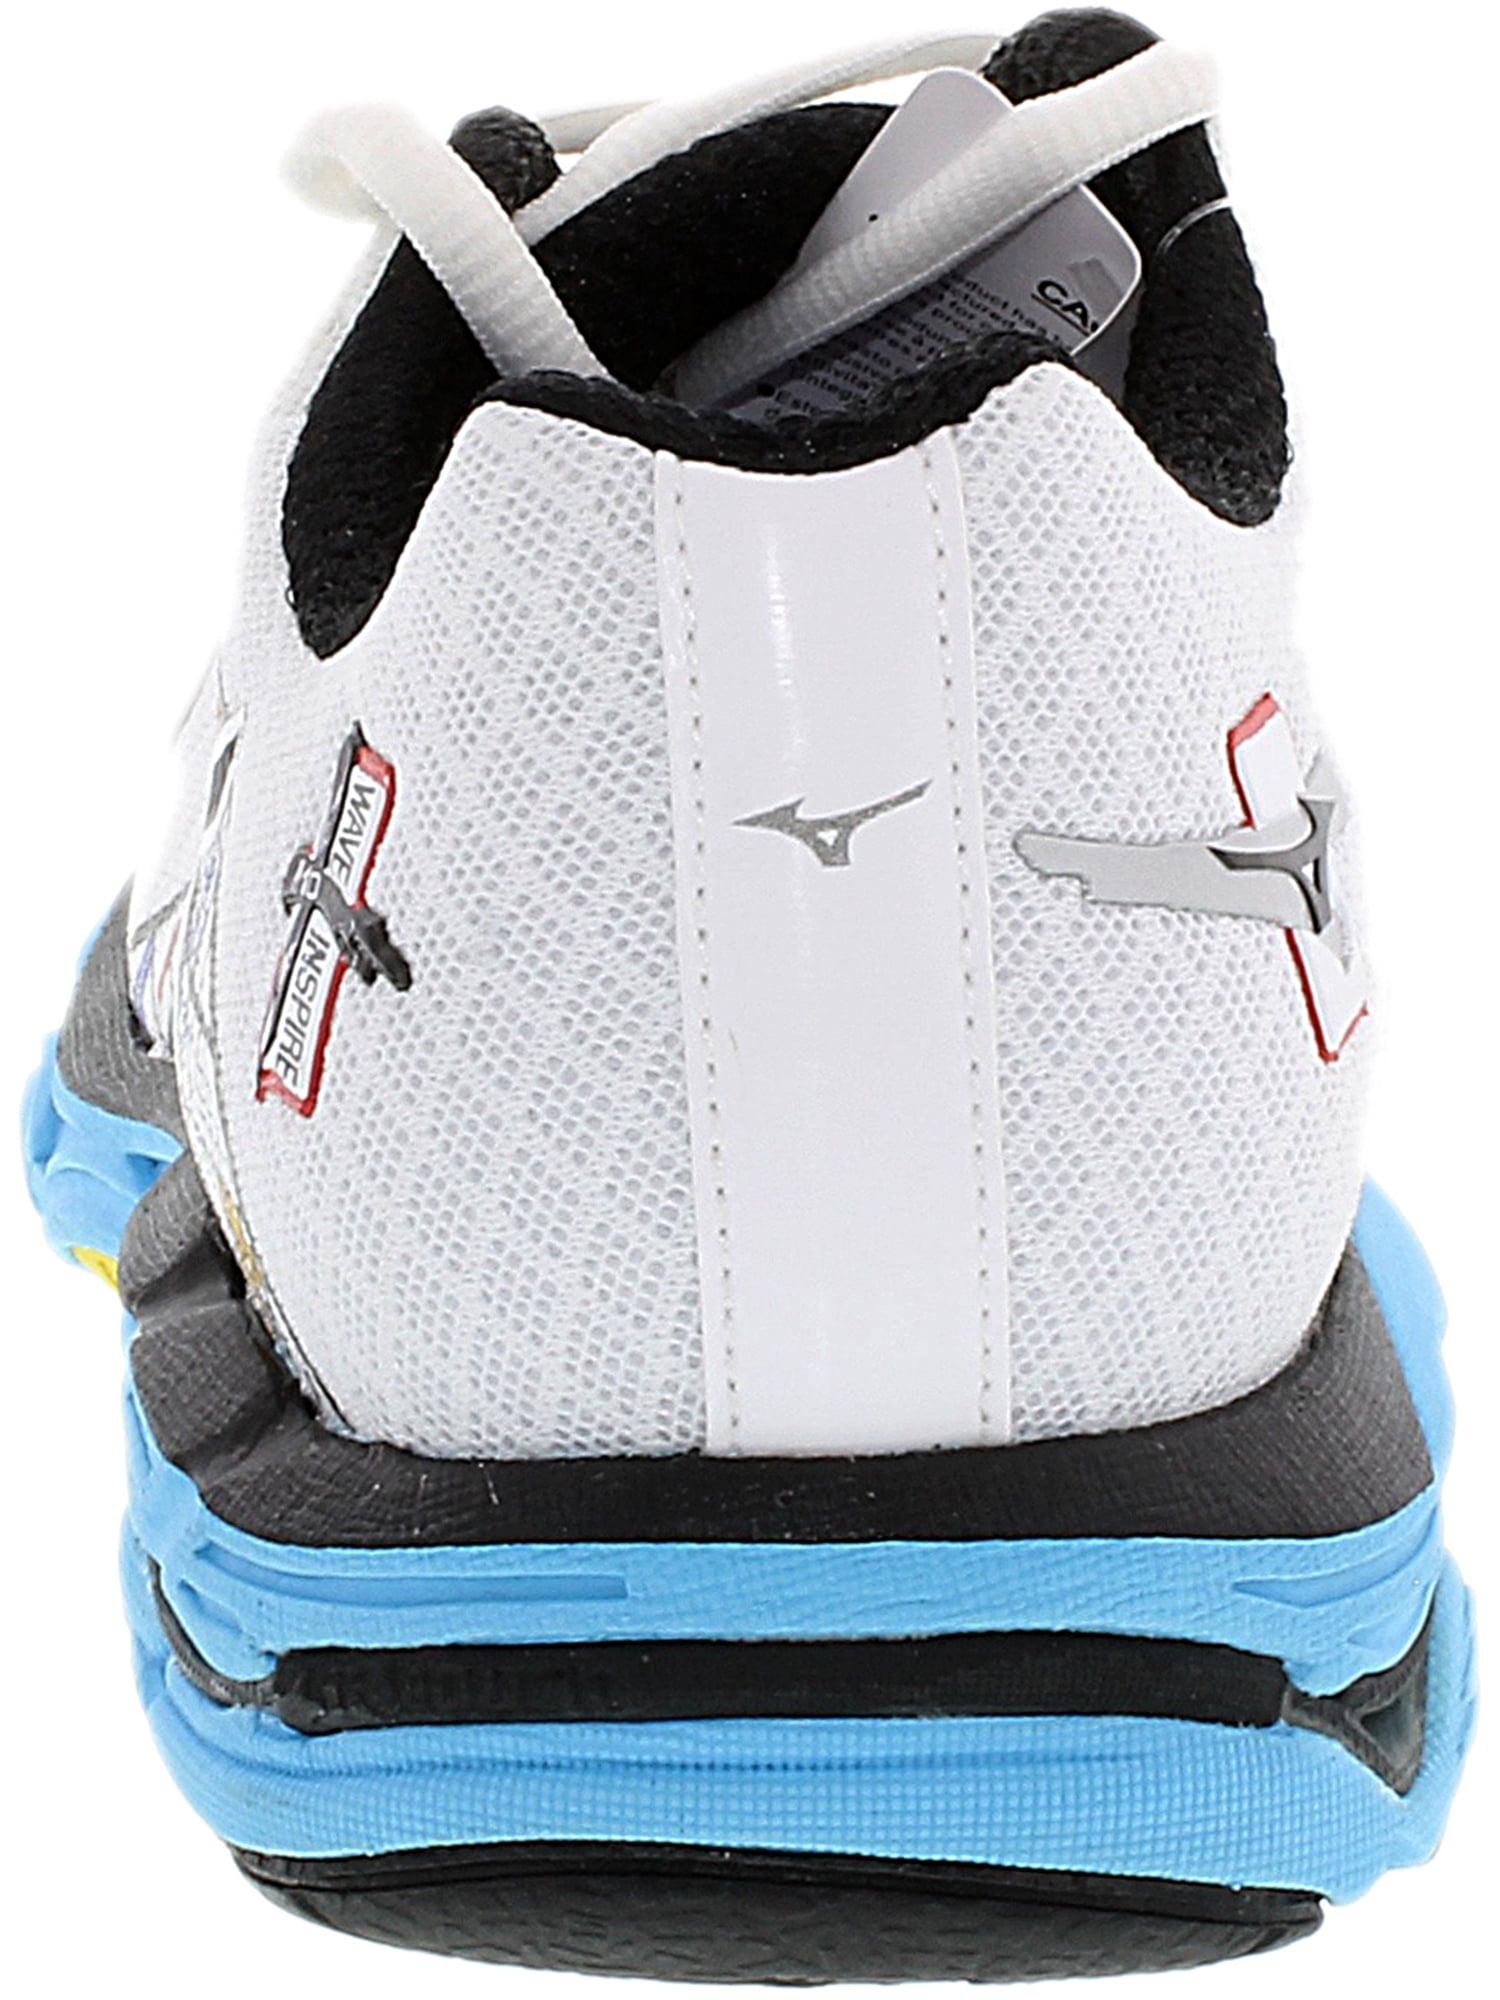 Mizuno Women's Wave Inspire 10 Yellow / Black Blue Ankle-High Running Shoe - 4M